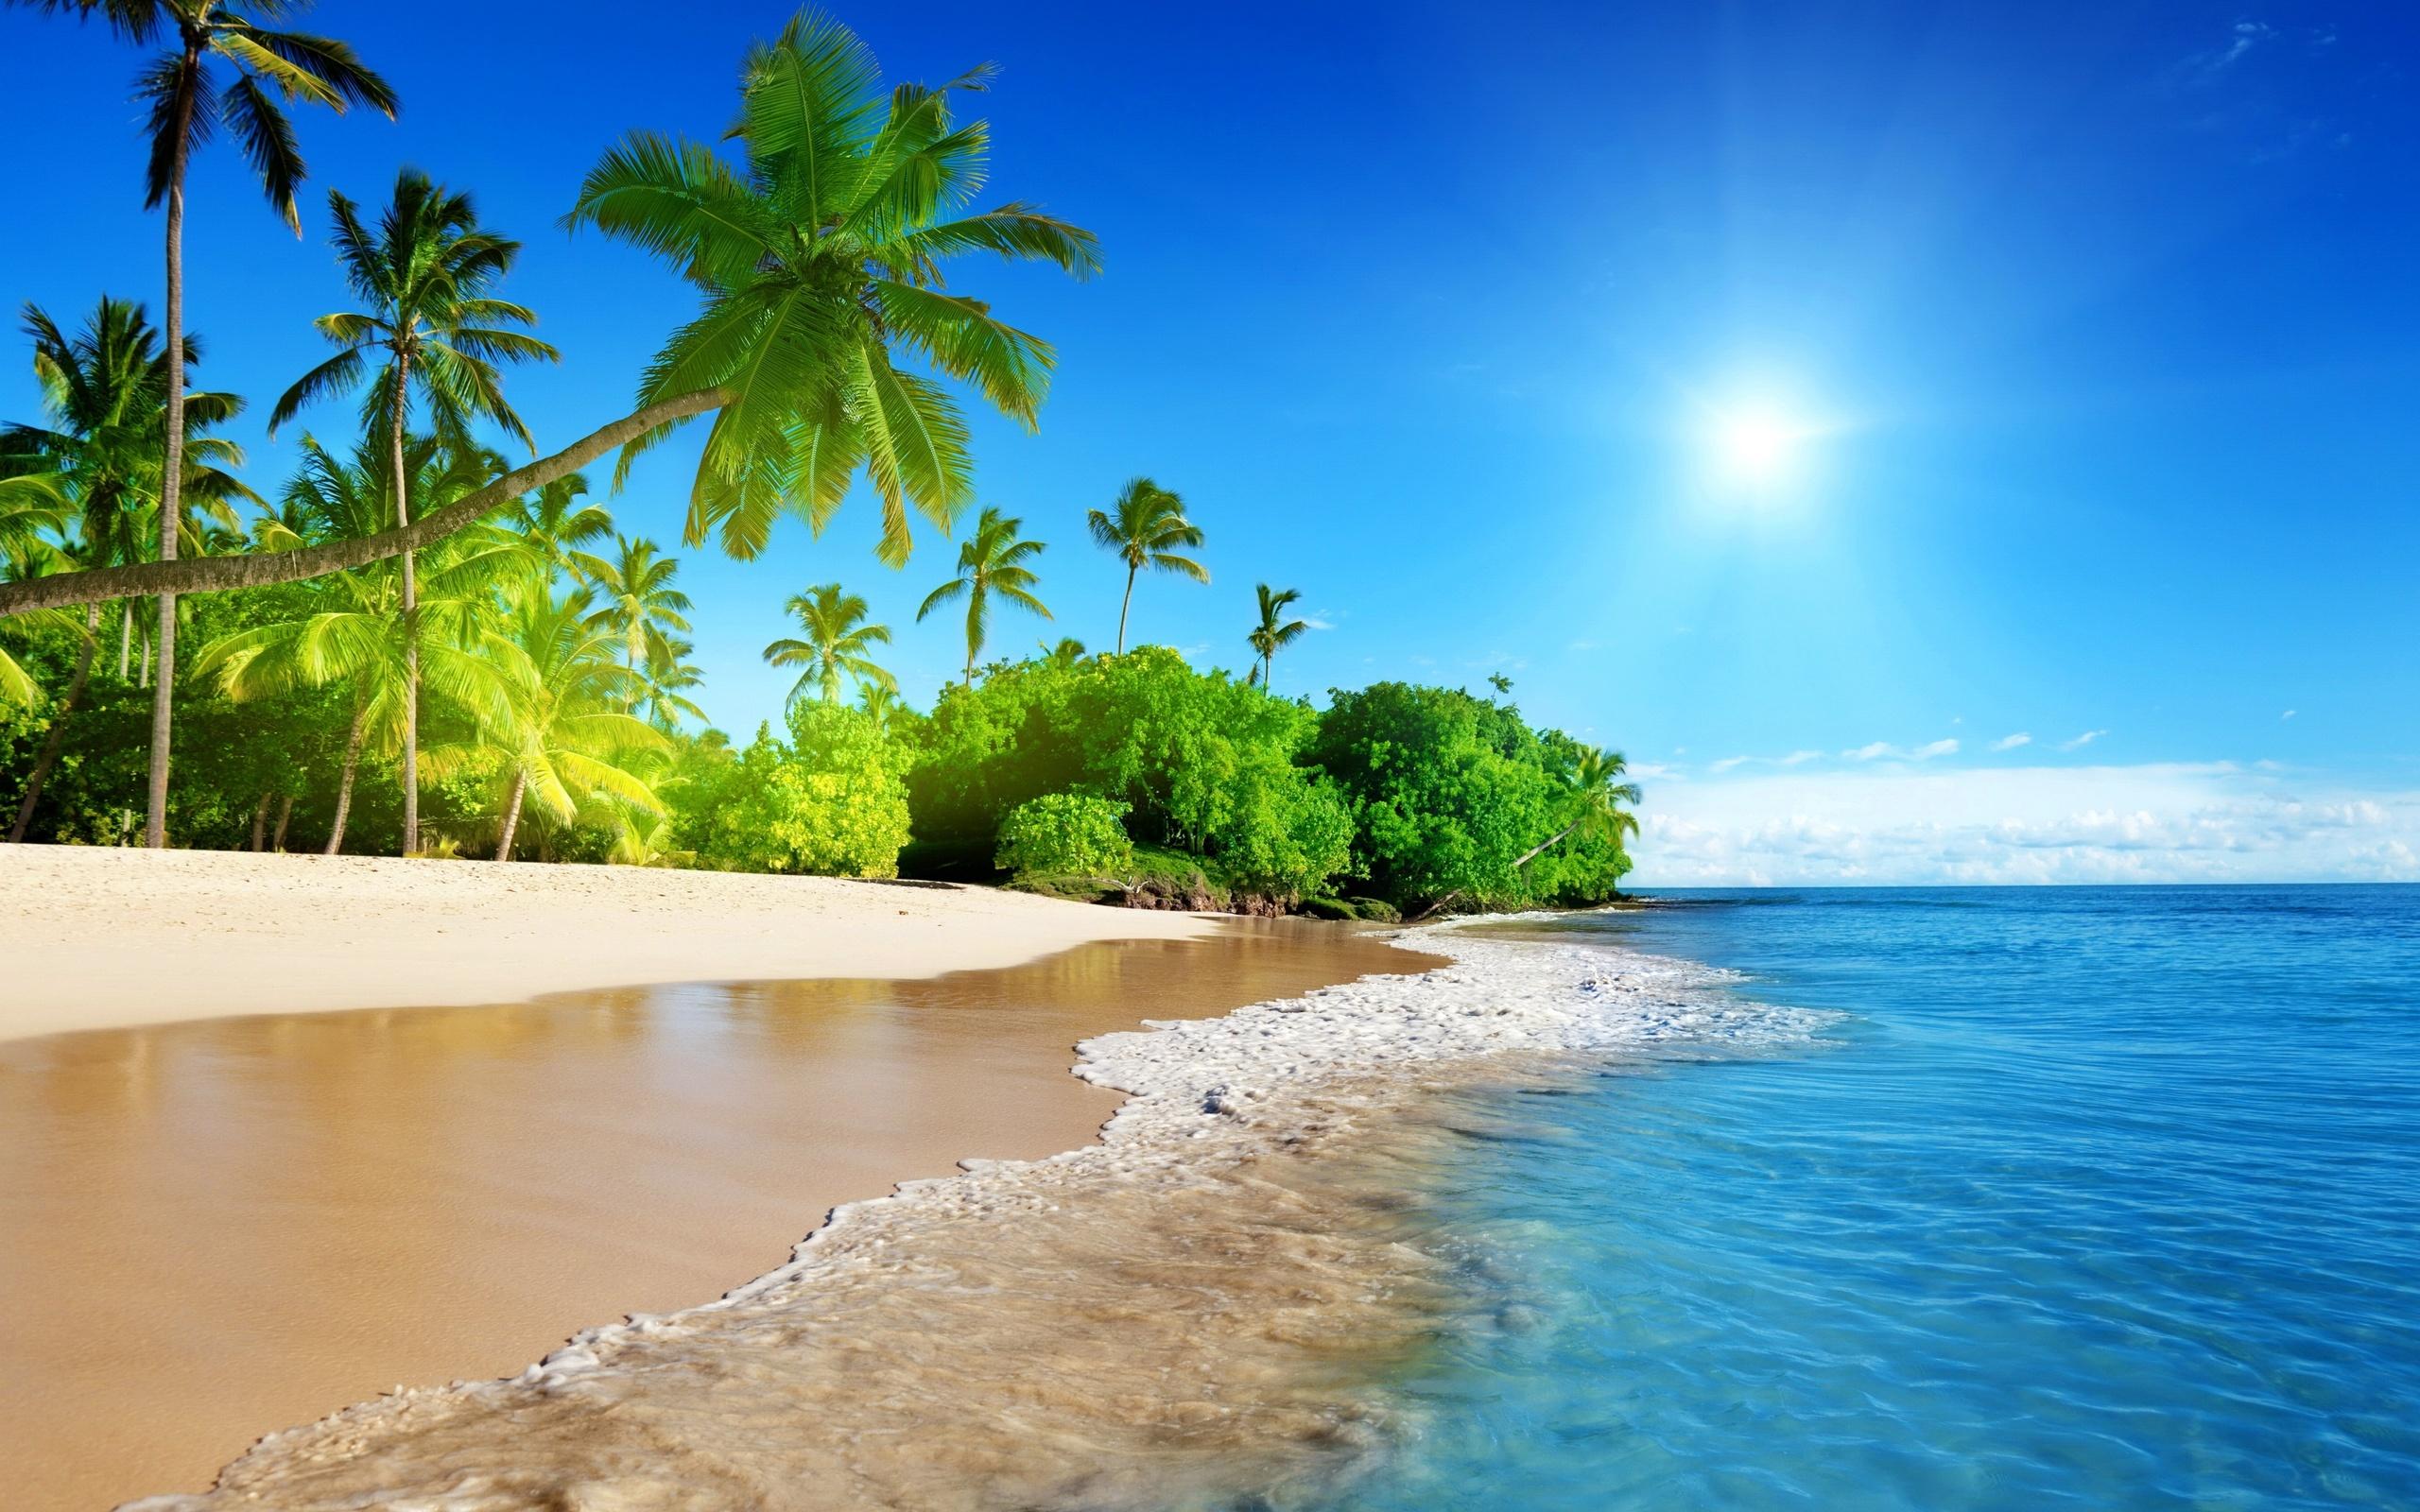 Дню, море и лето картинки